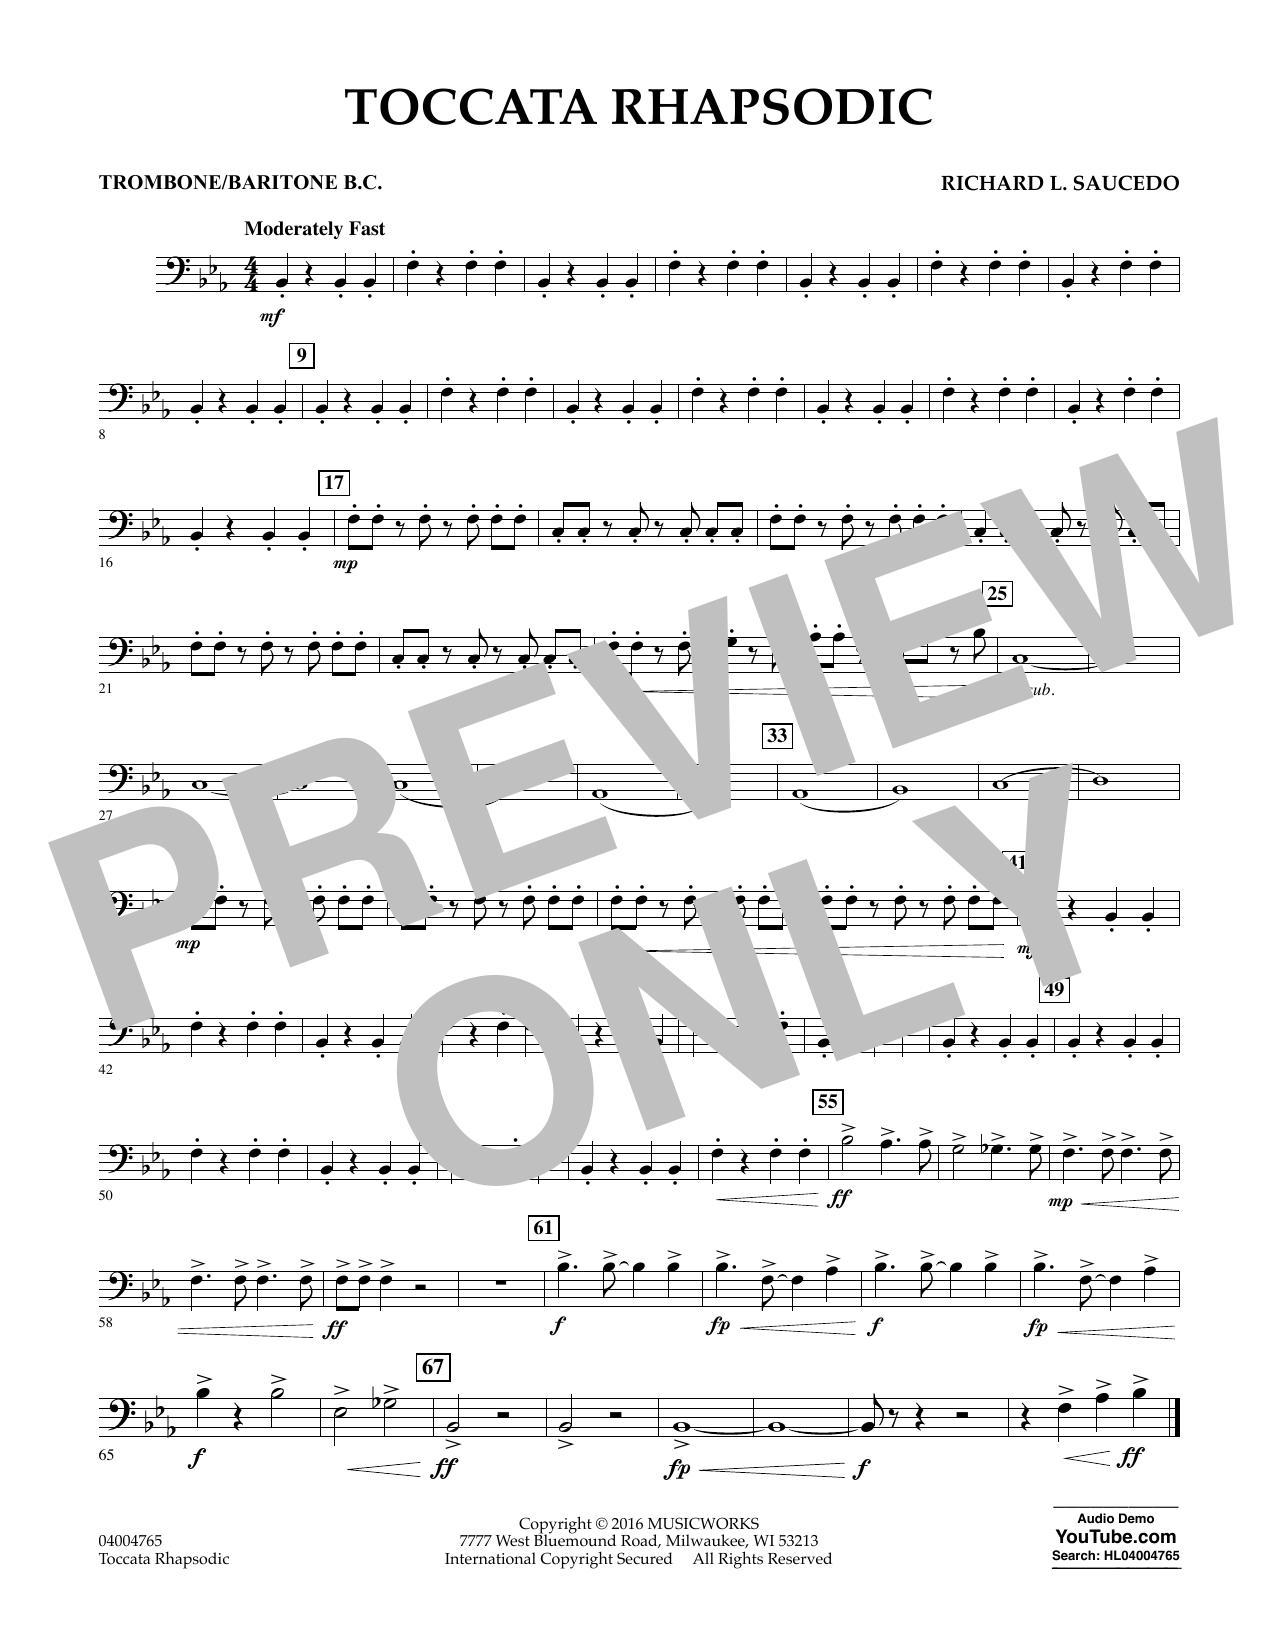 Toccata Rhapsodic - Trombone/Baritone B.C. (Concert Band)